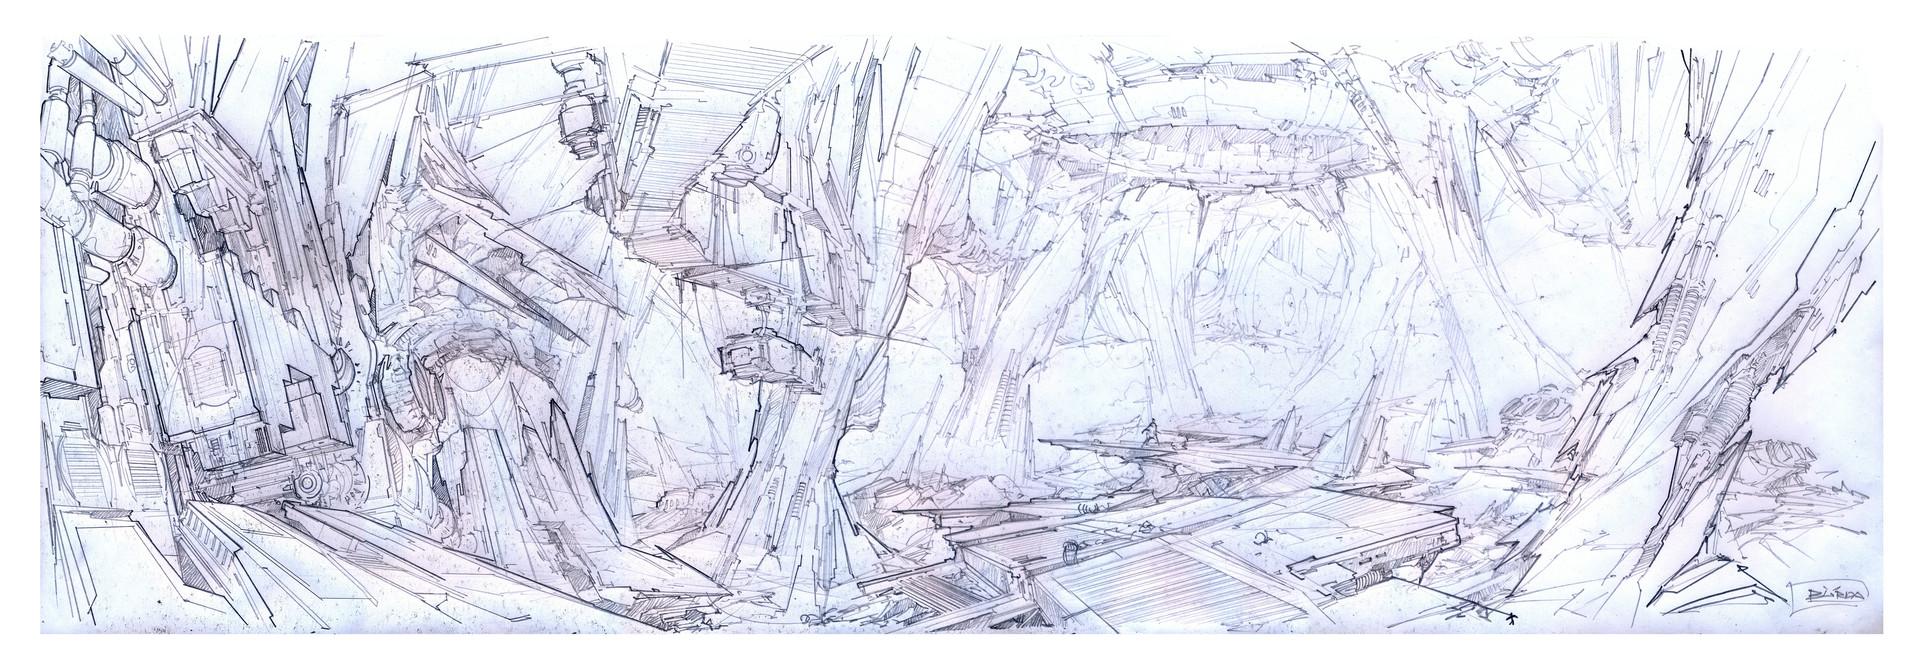 Alejandro burdisio bocetos sector industrial1 telm panoramico